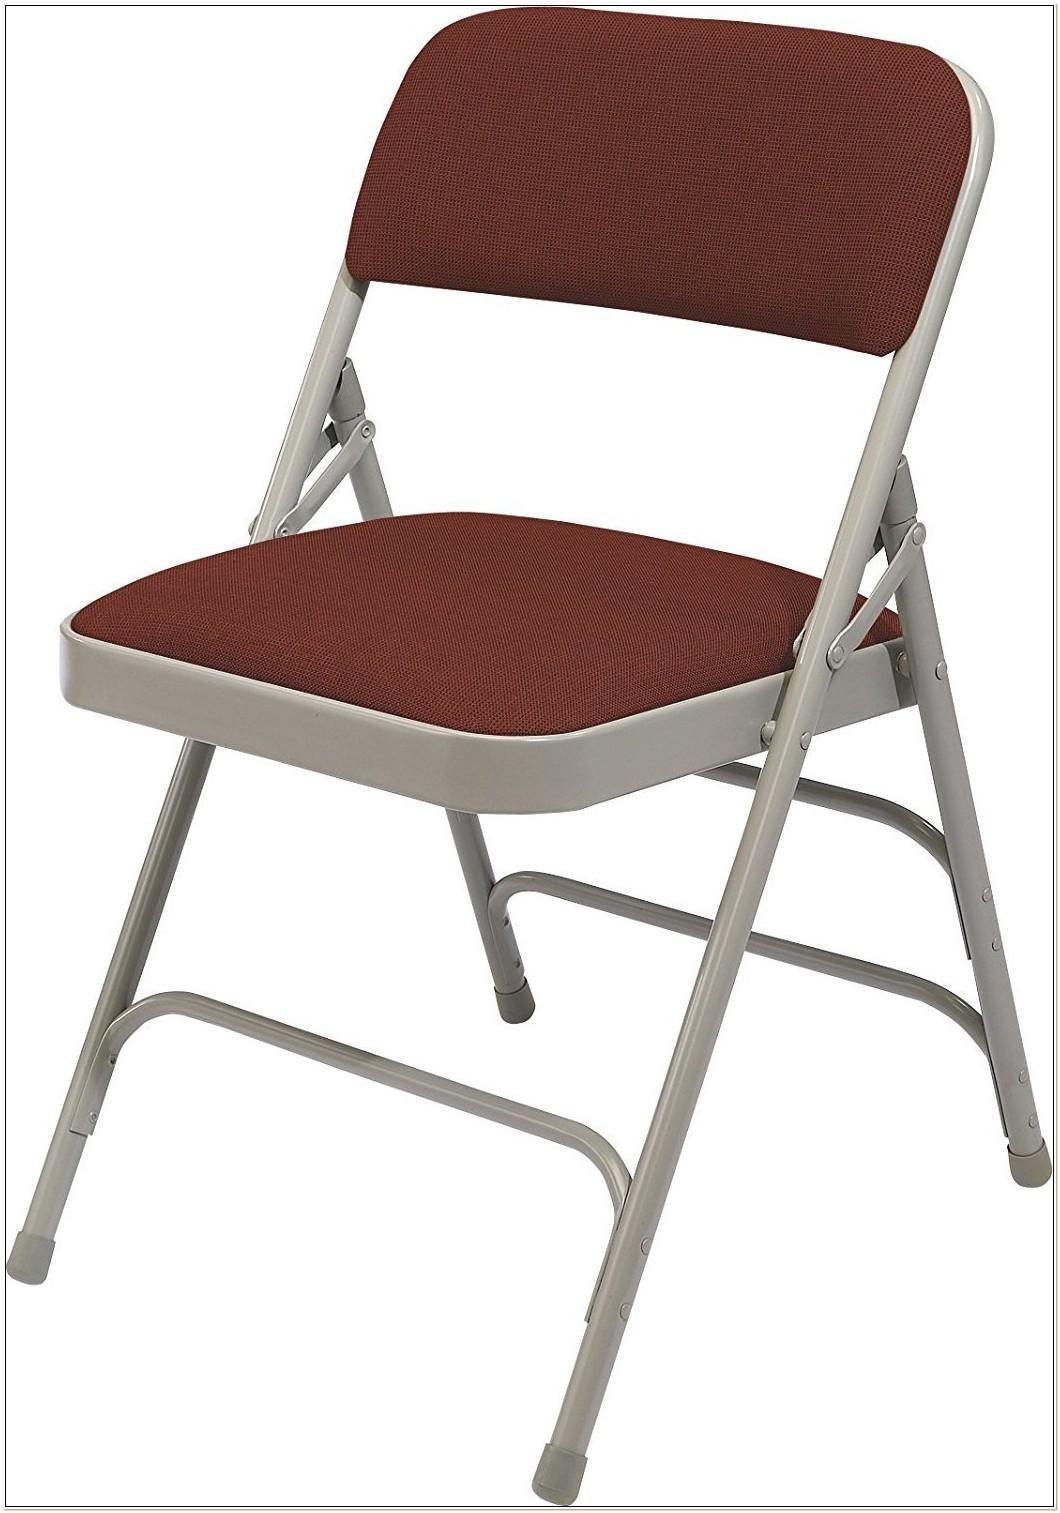 Cosco Xl Series Fabric Padded Folding Chairs